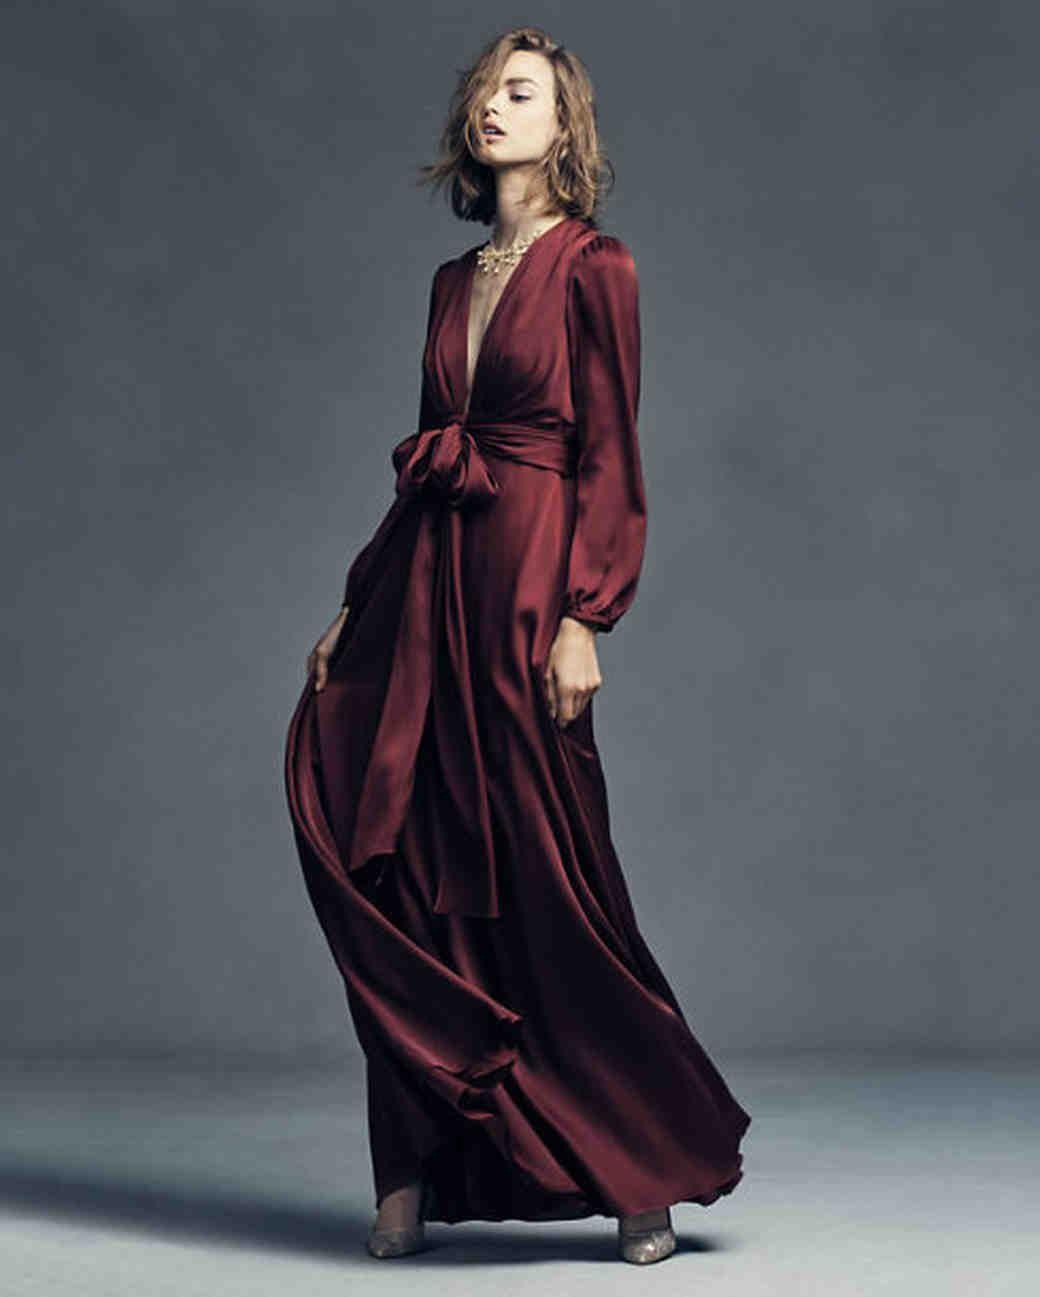 Burgundy Bridesmaid Dresses   Dress me pretty   Pinterest   Choices ...